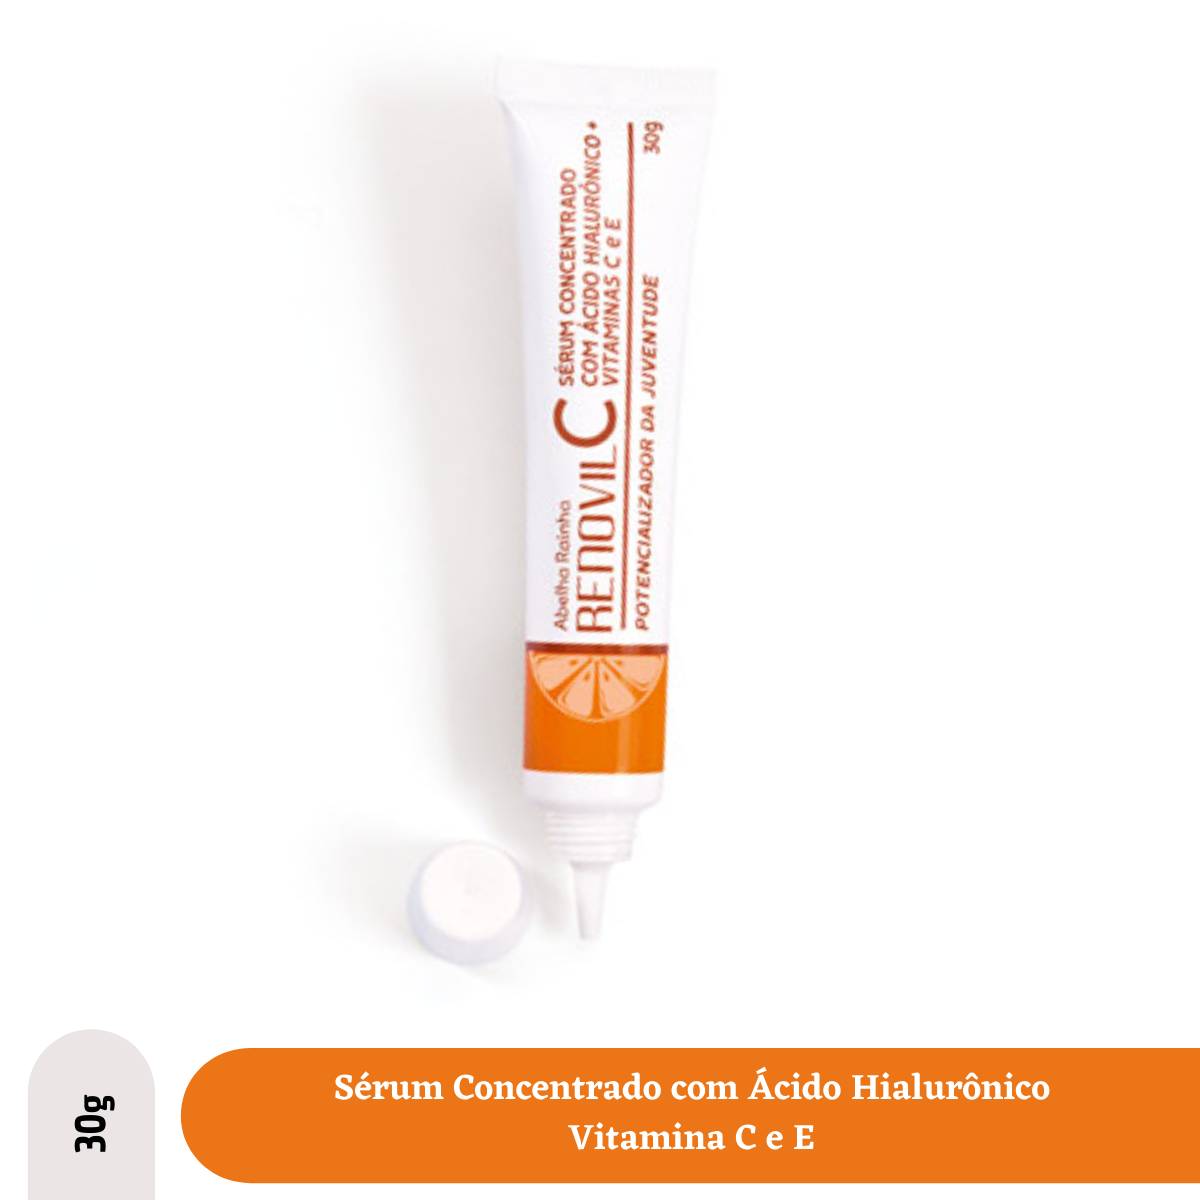 Renovil-C Serum Concentrado Acido Hialuronico Vit. C e E 30g